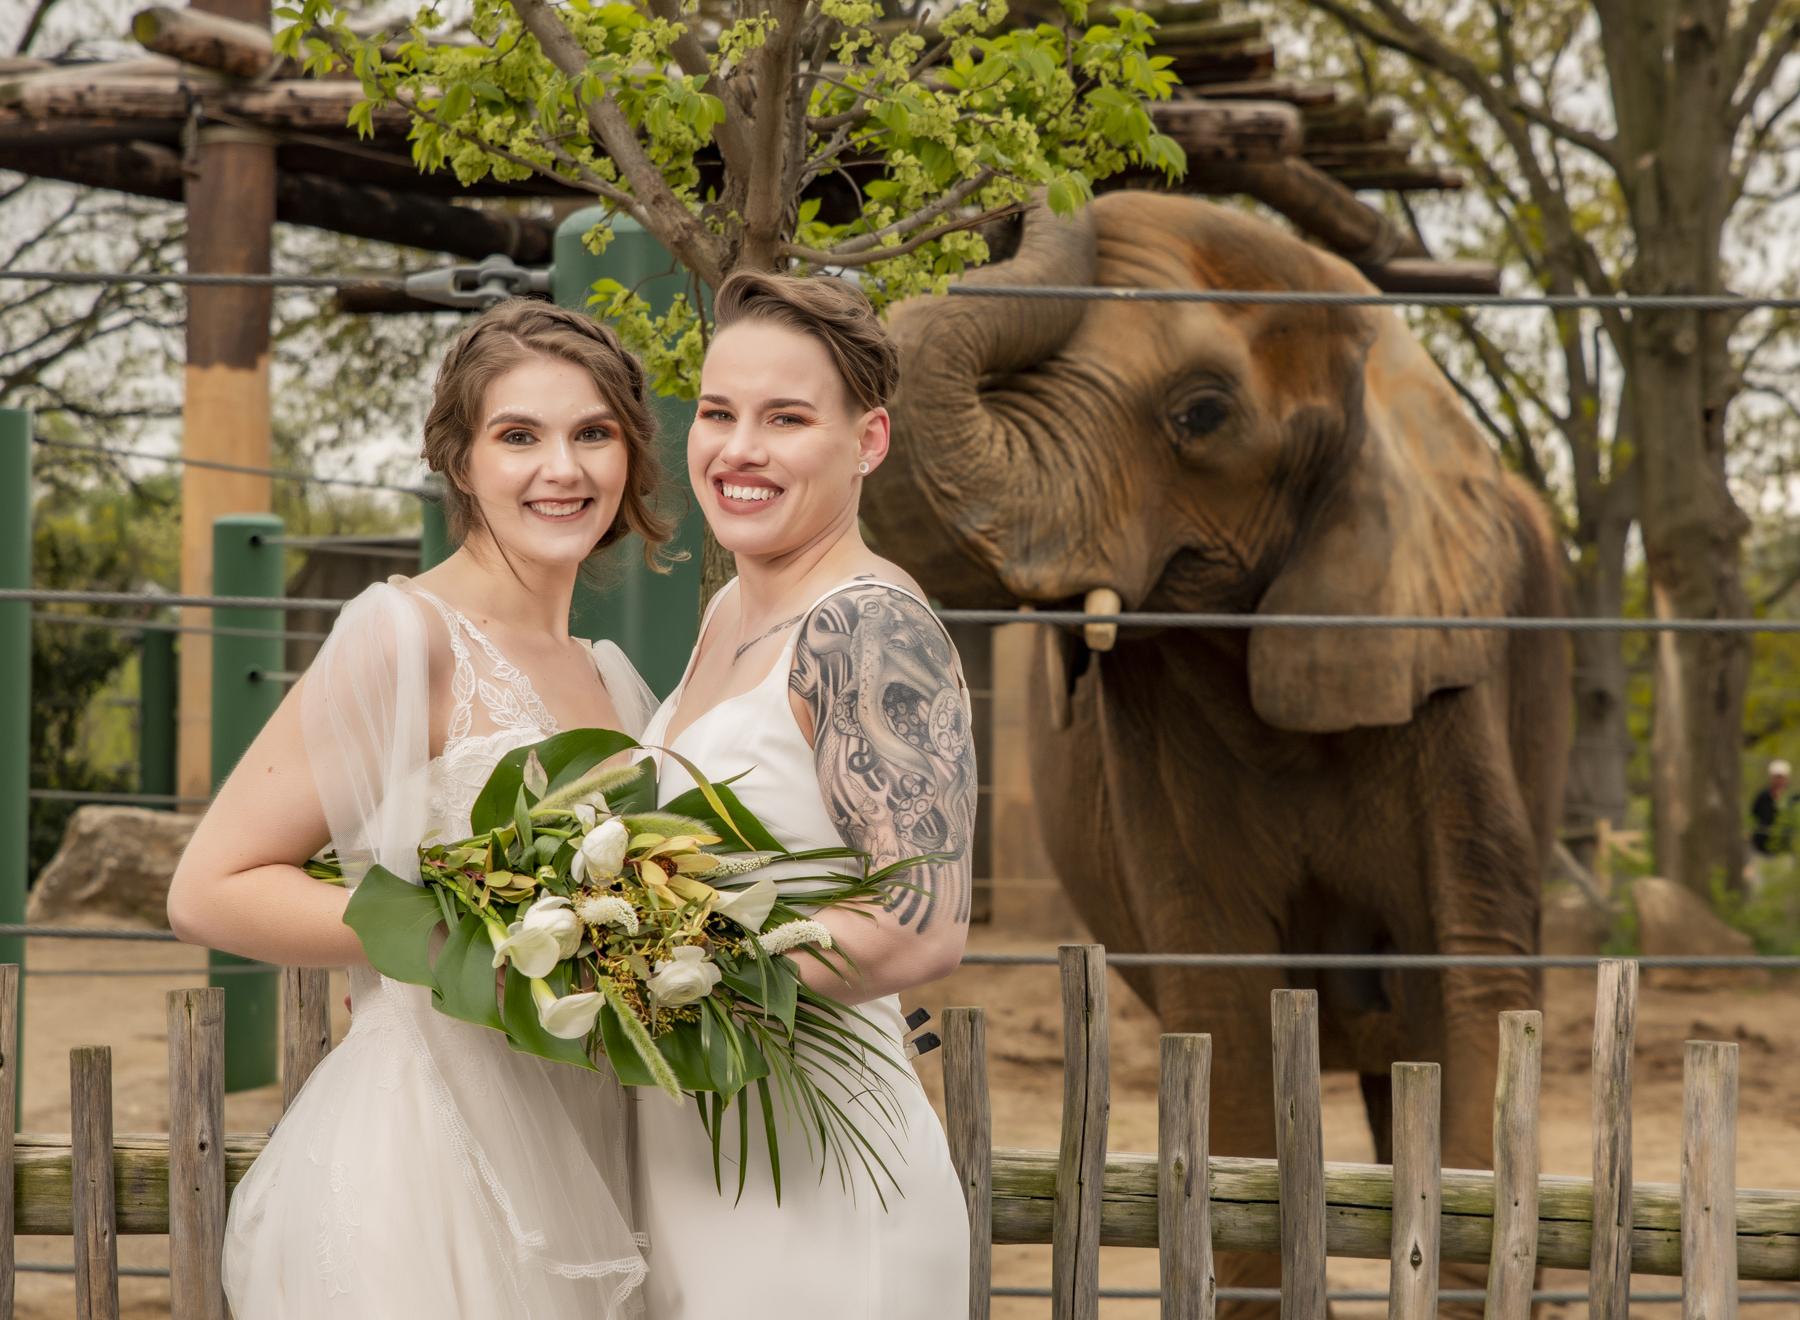 Louisville-Zoo-LGBTQ-Wedding-Styled-Shoot